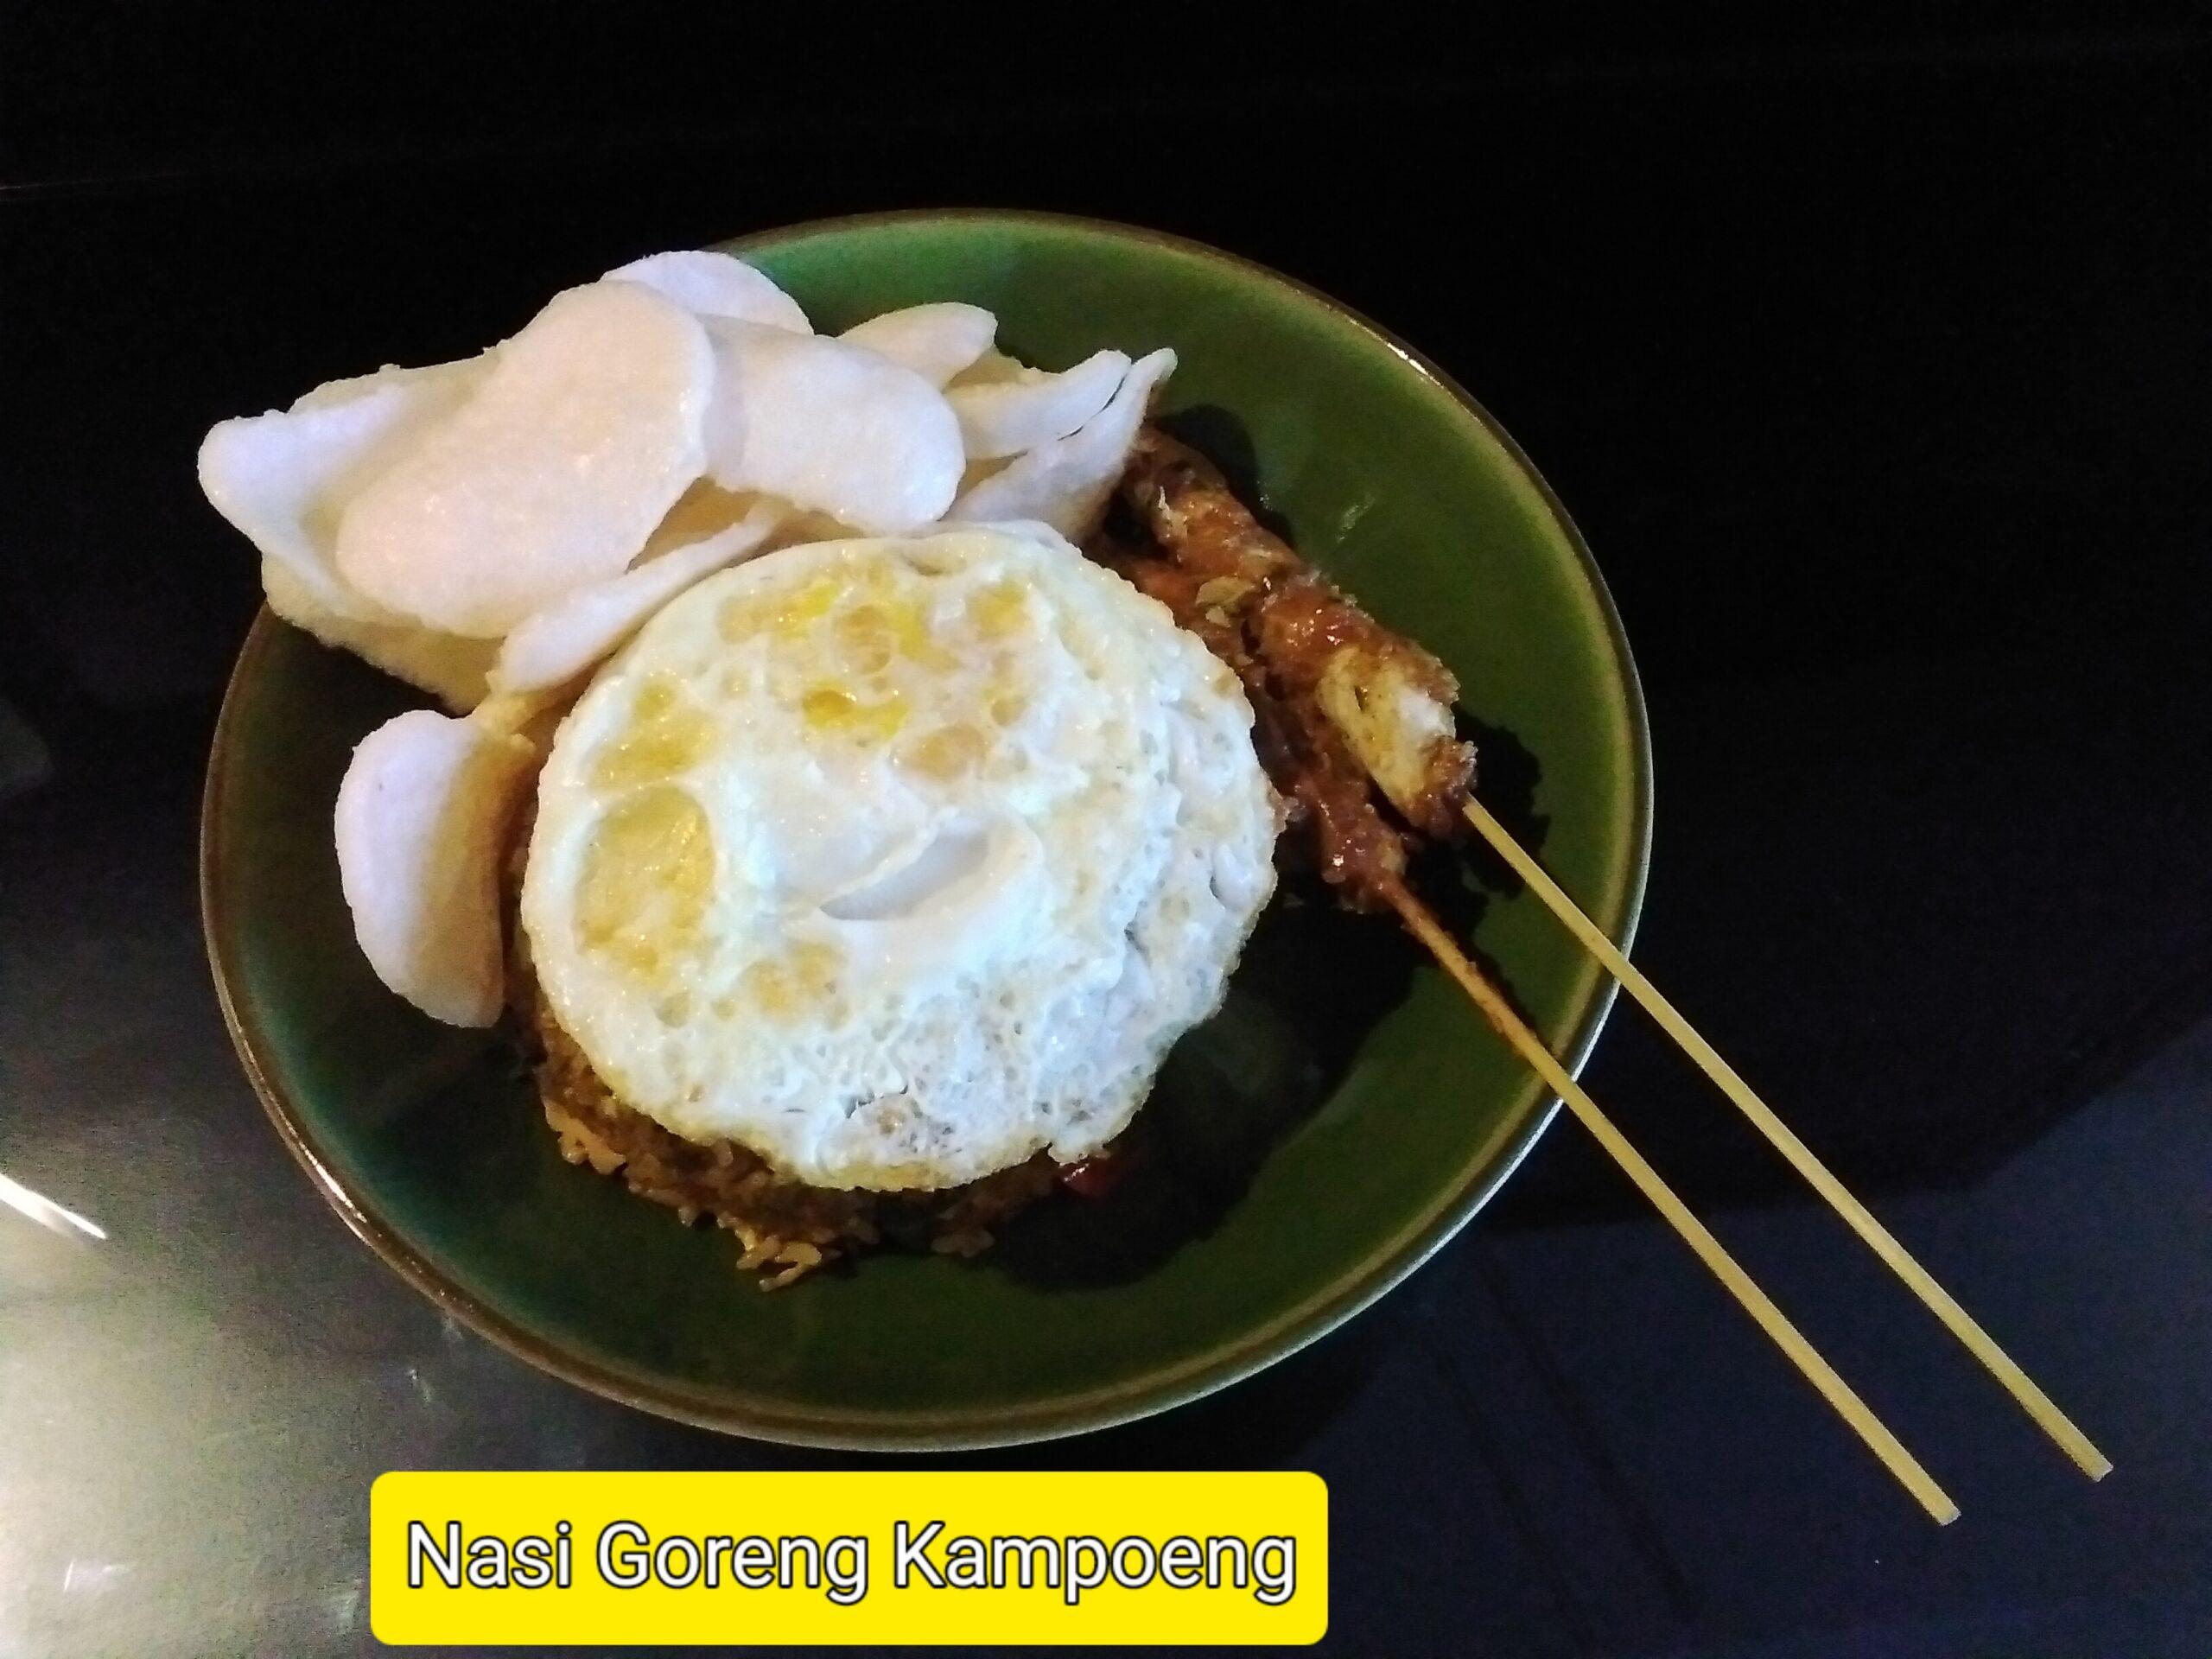 Nasi Goreng Kampoeng